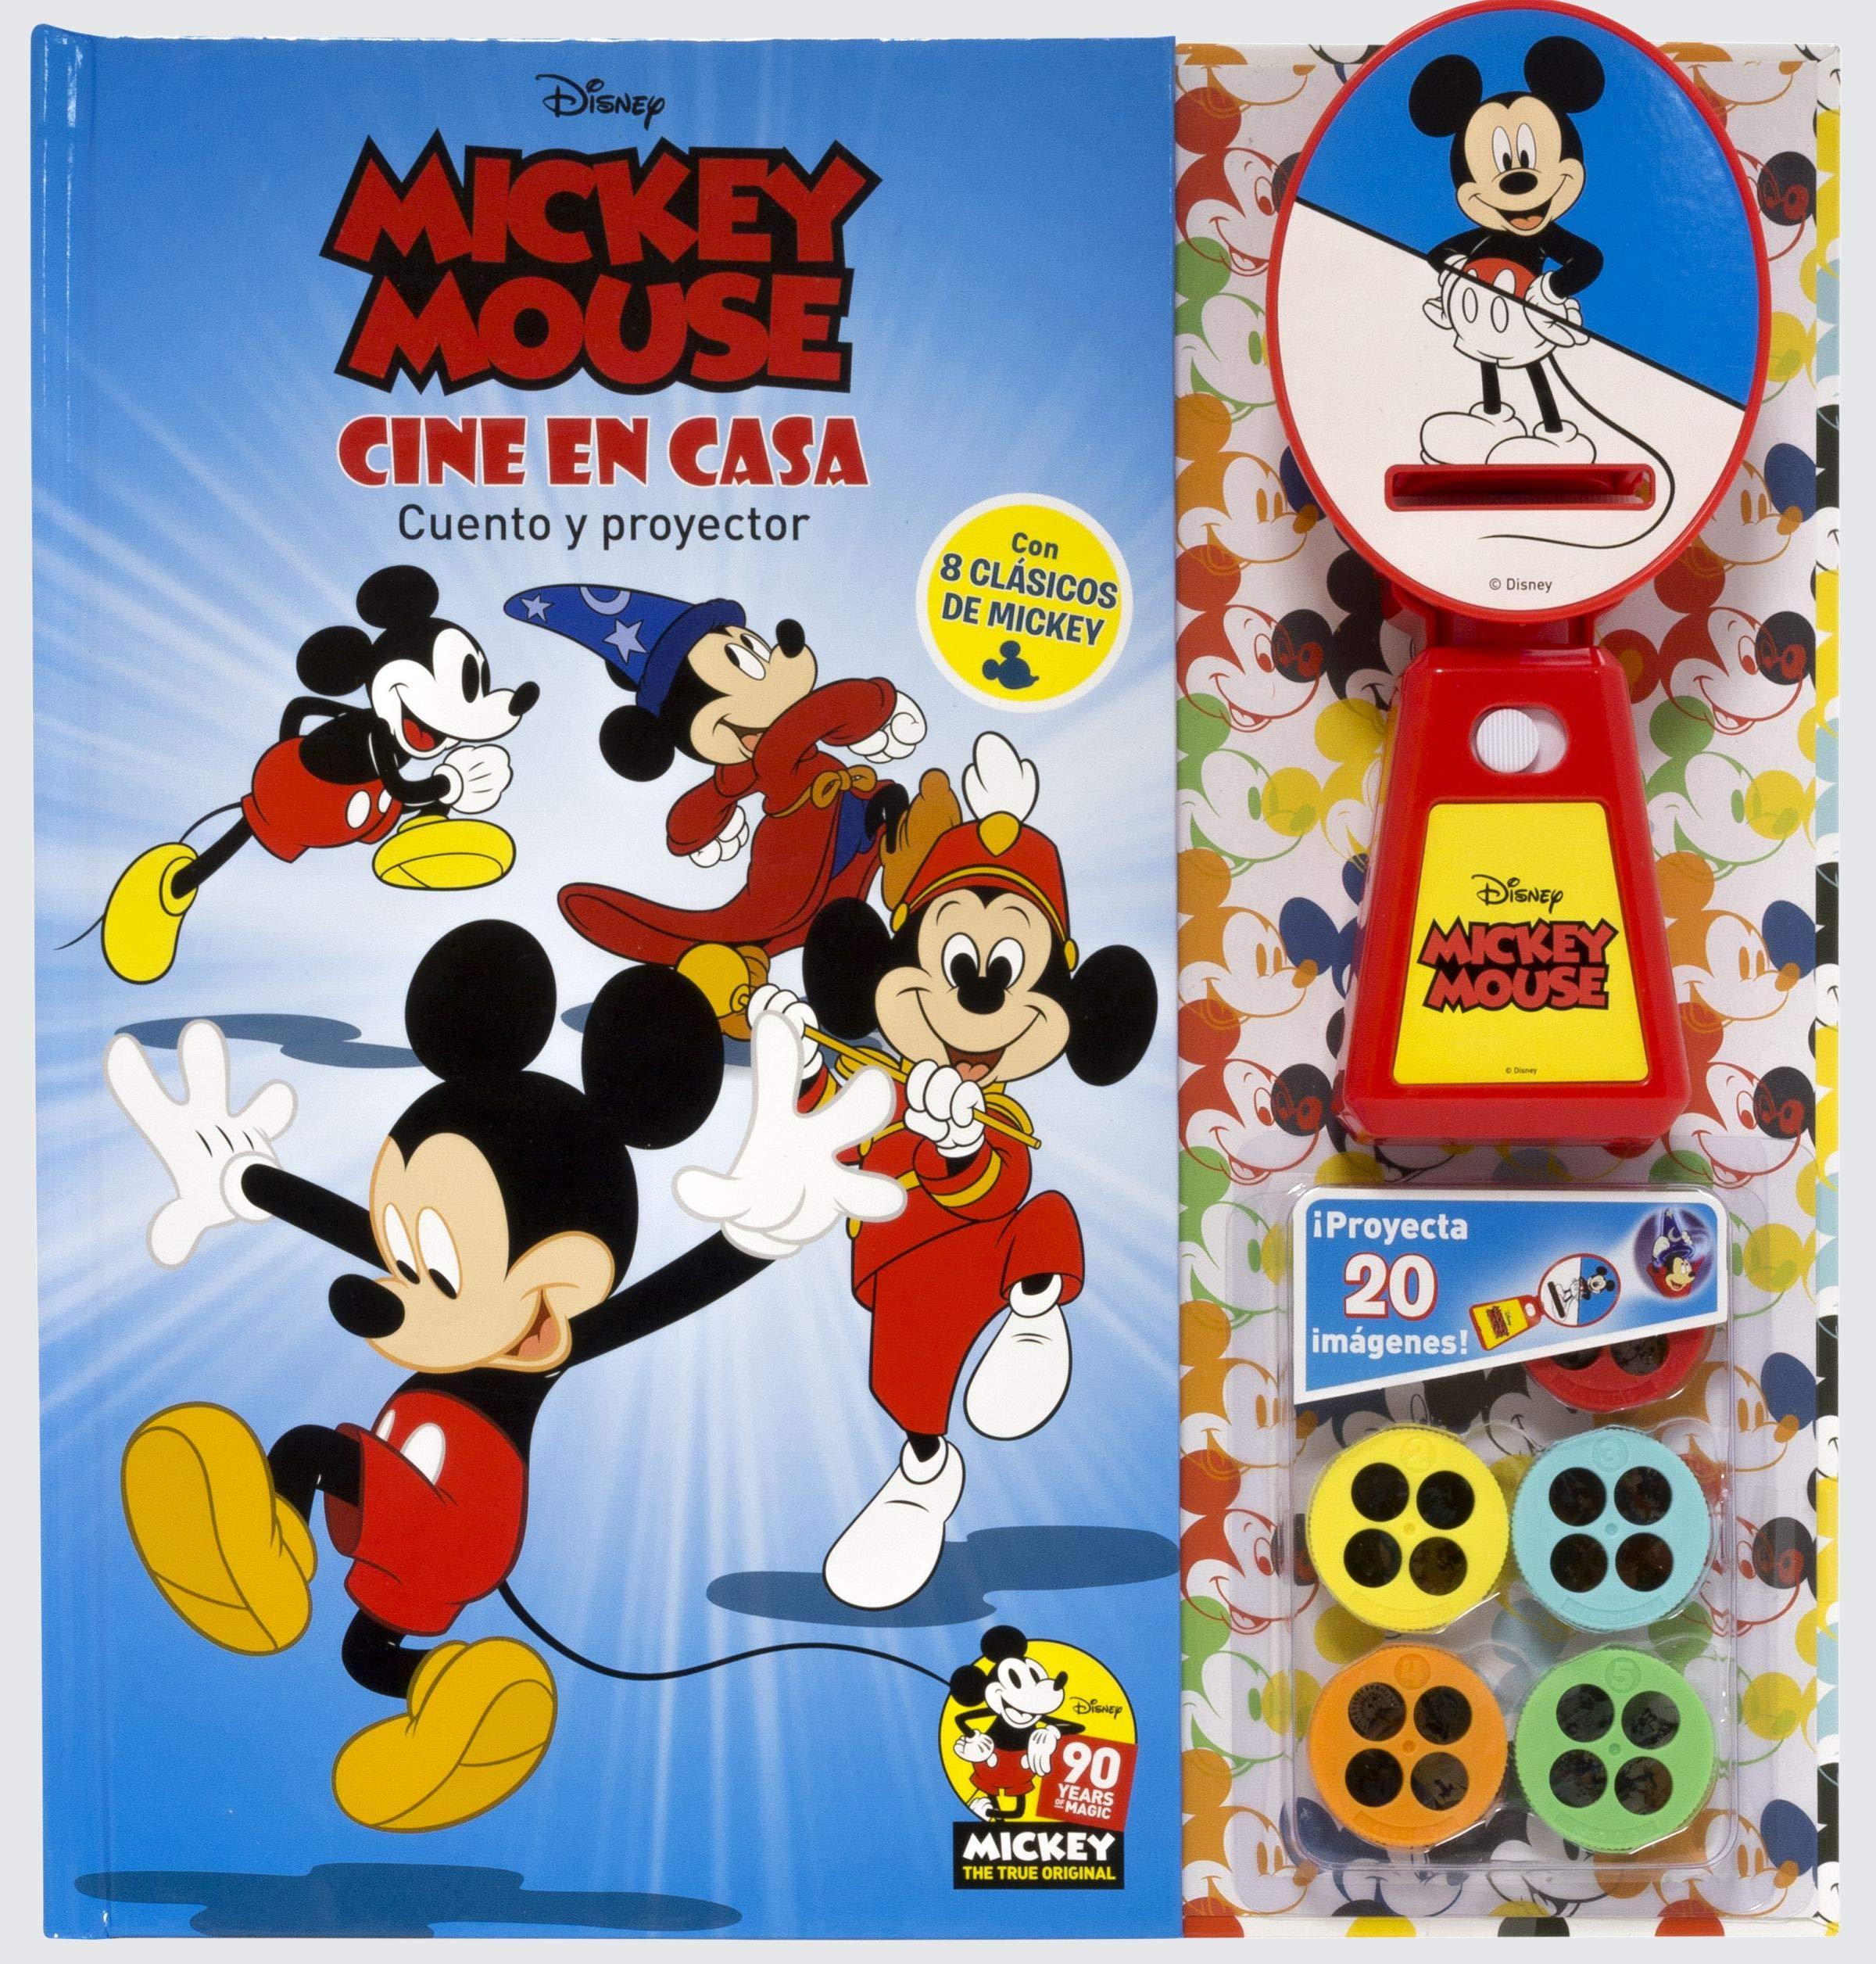 Mickey. Cine en casa: Disney: 9788416917402: Amazon.com: Books